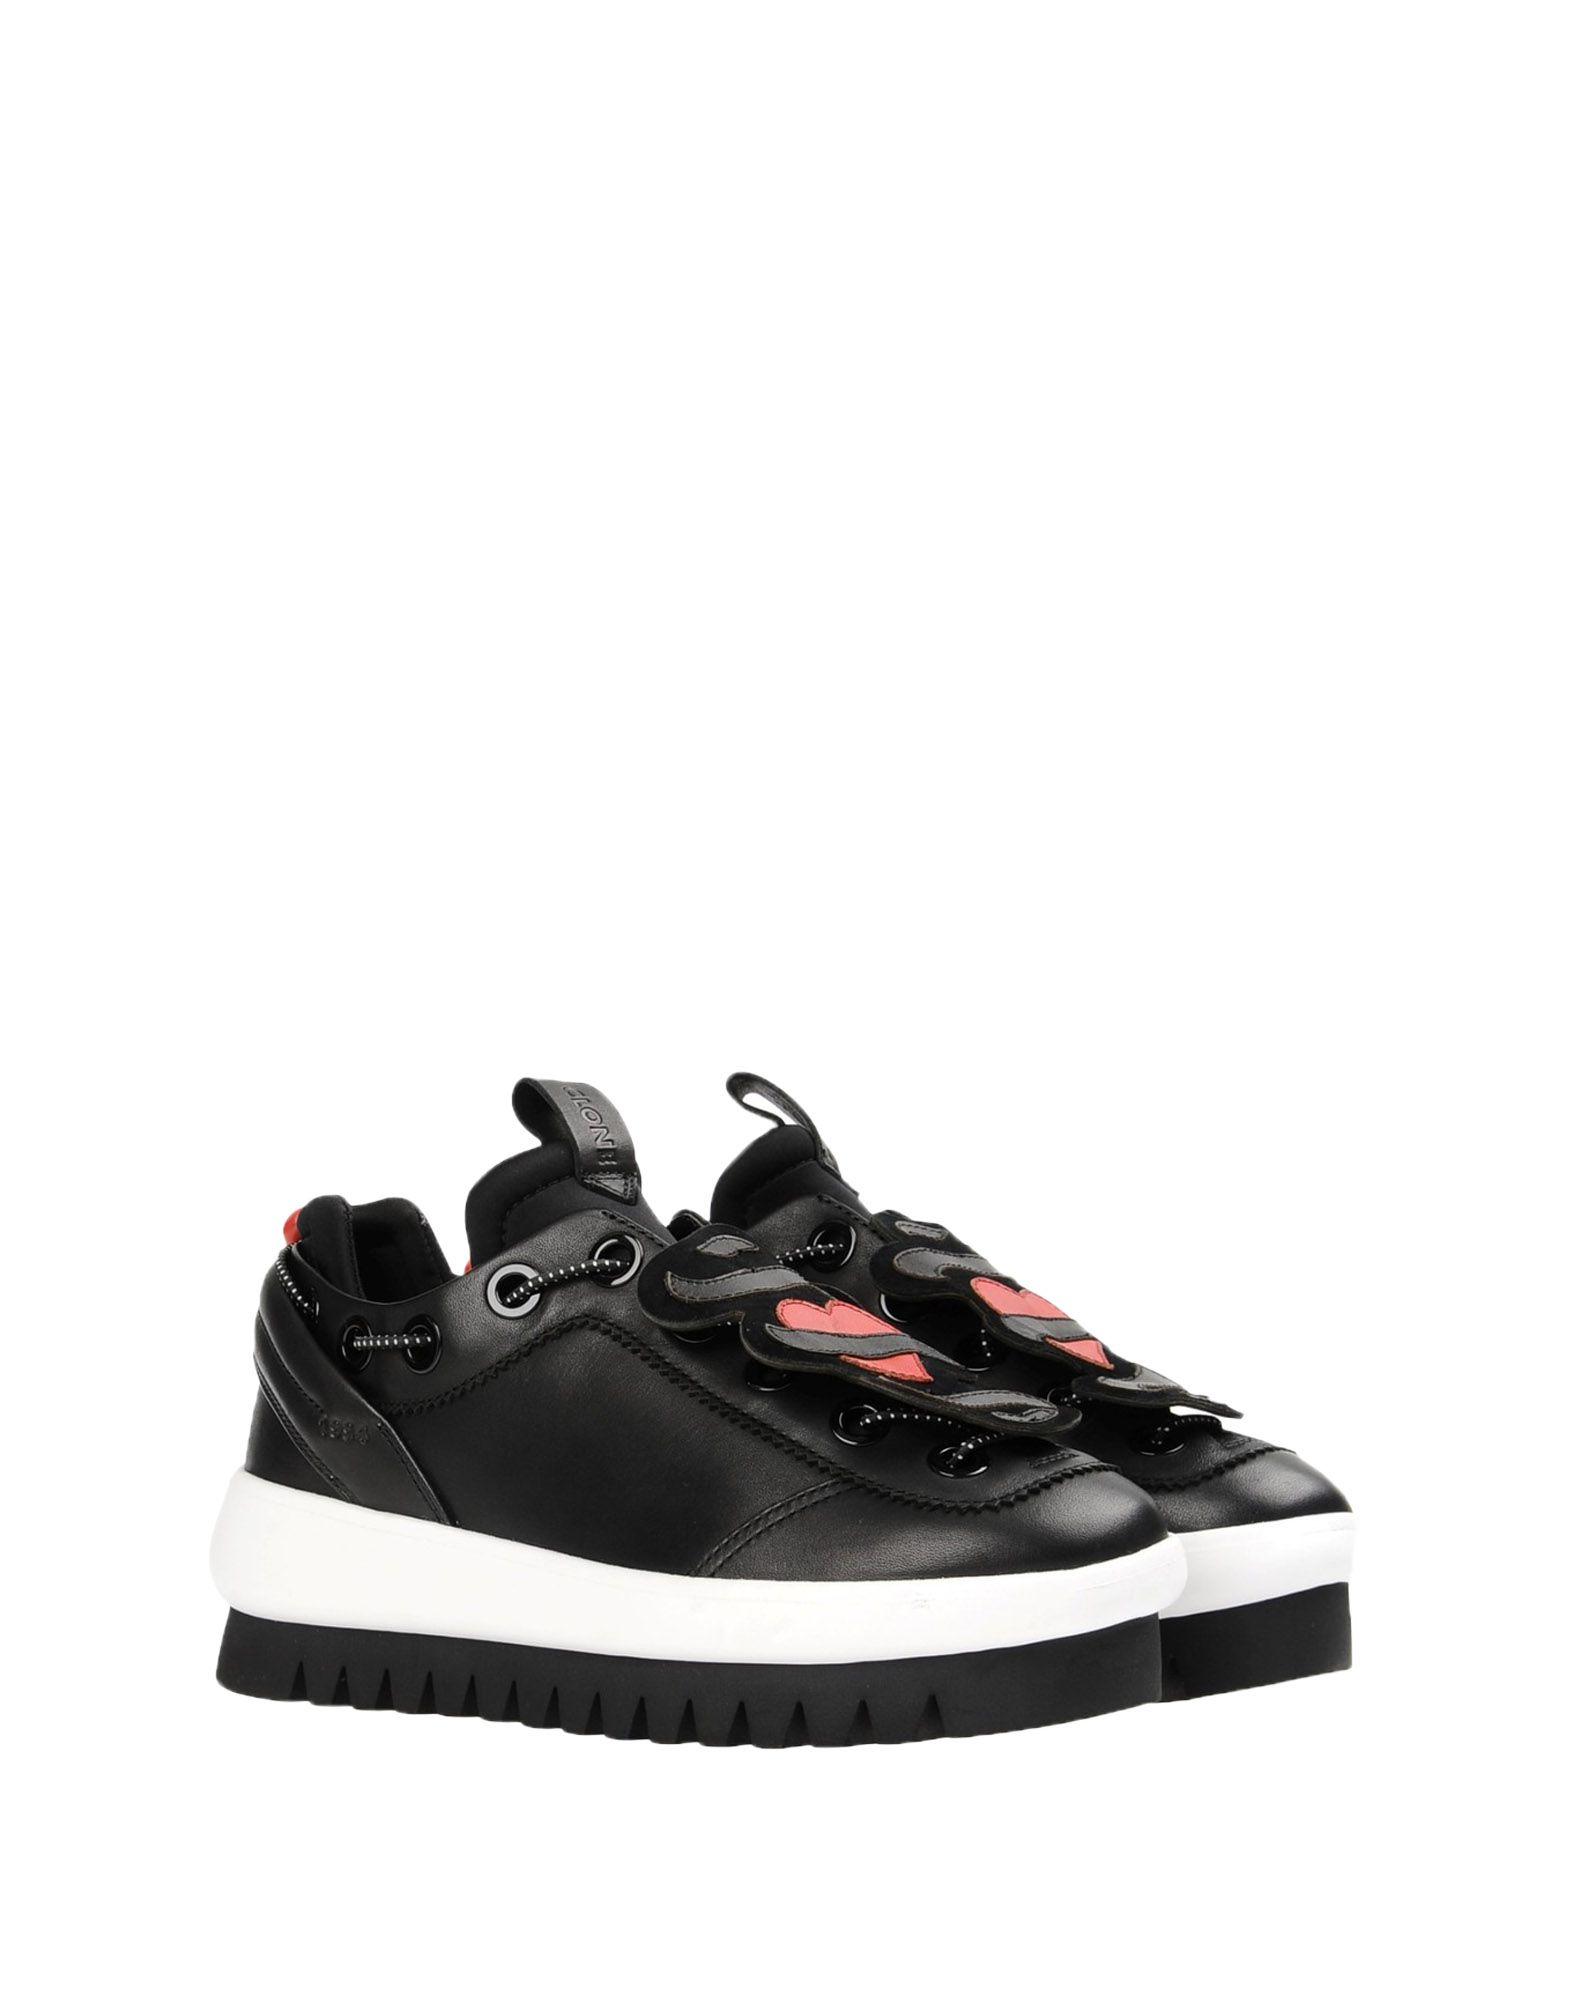 Sneakers Clone Rocmoon - Femme - Sneakers Clone sur